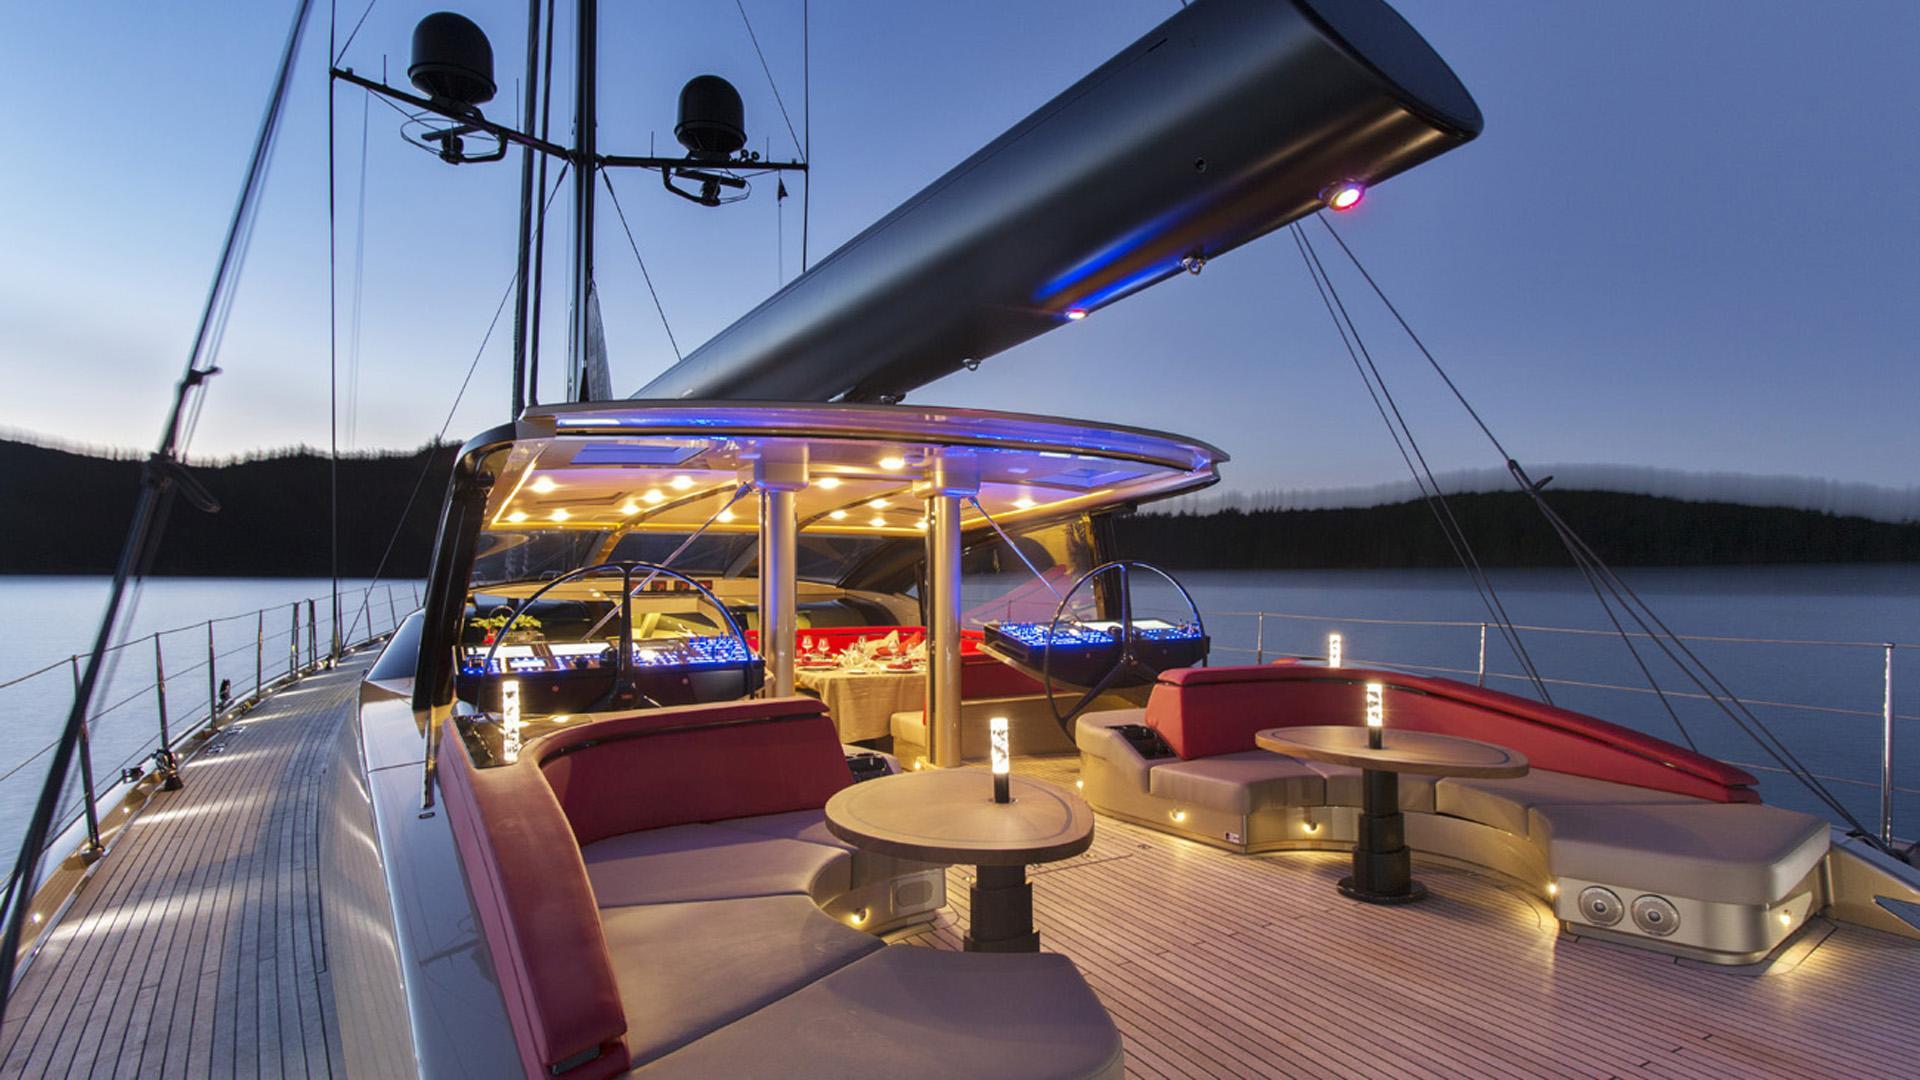 escapade sailing yacht fitzroy yachts 39m 2014 aft deck